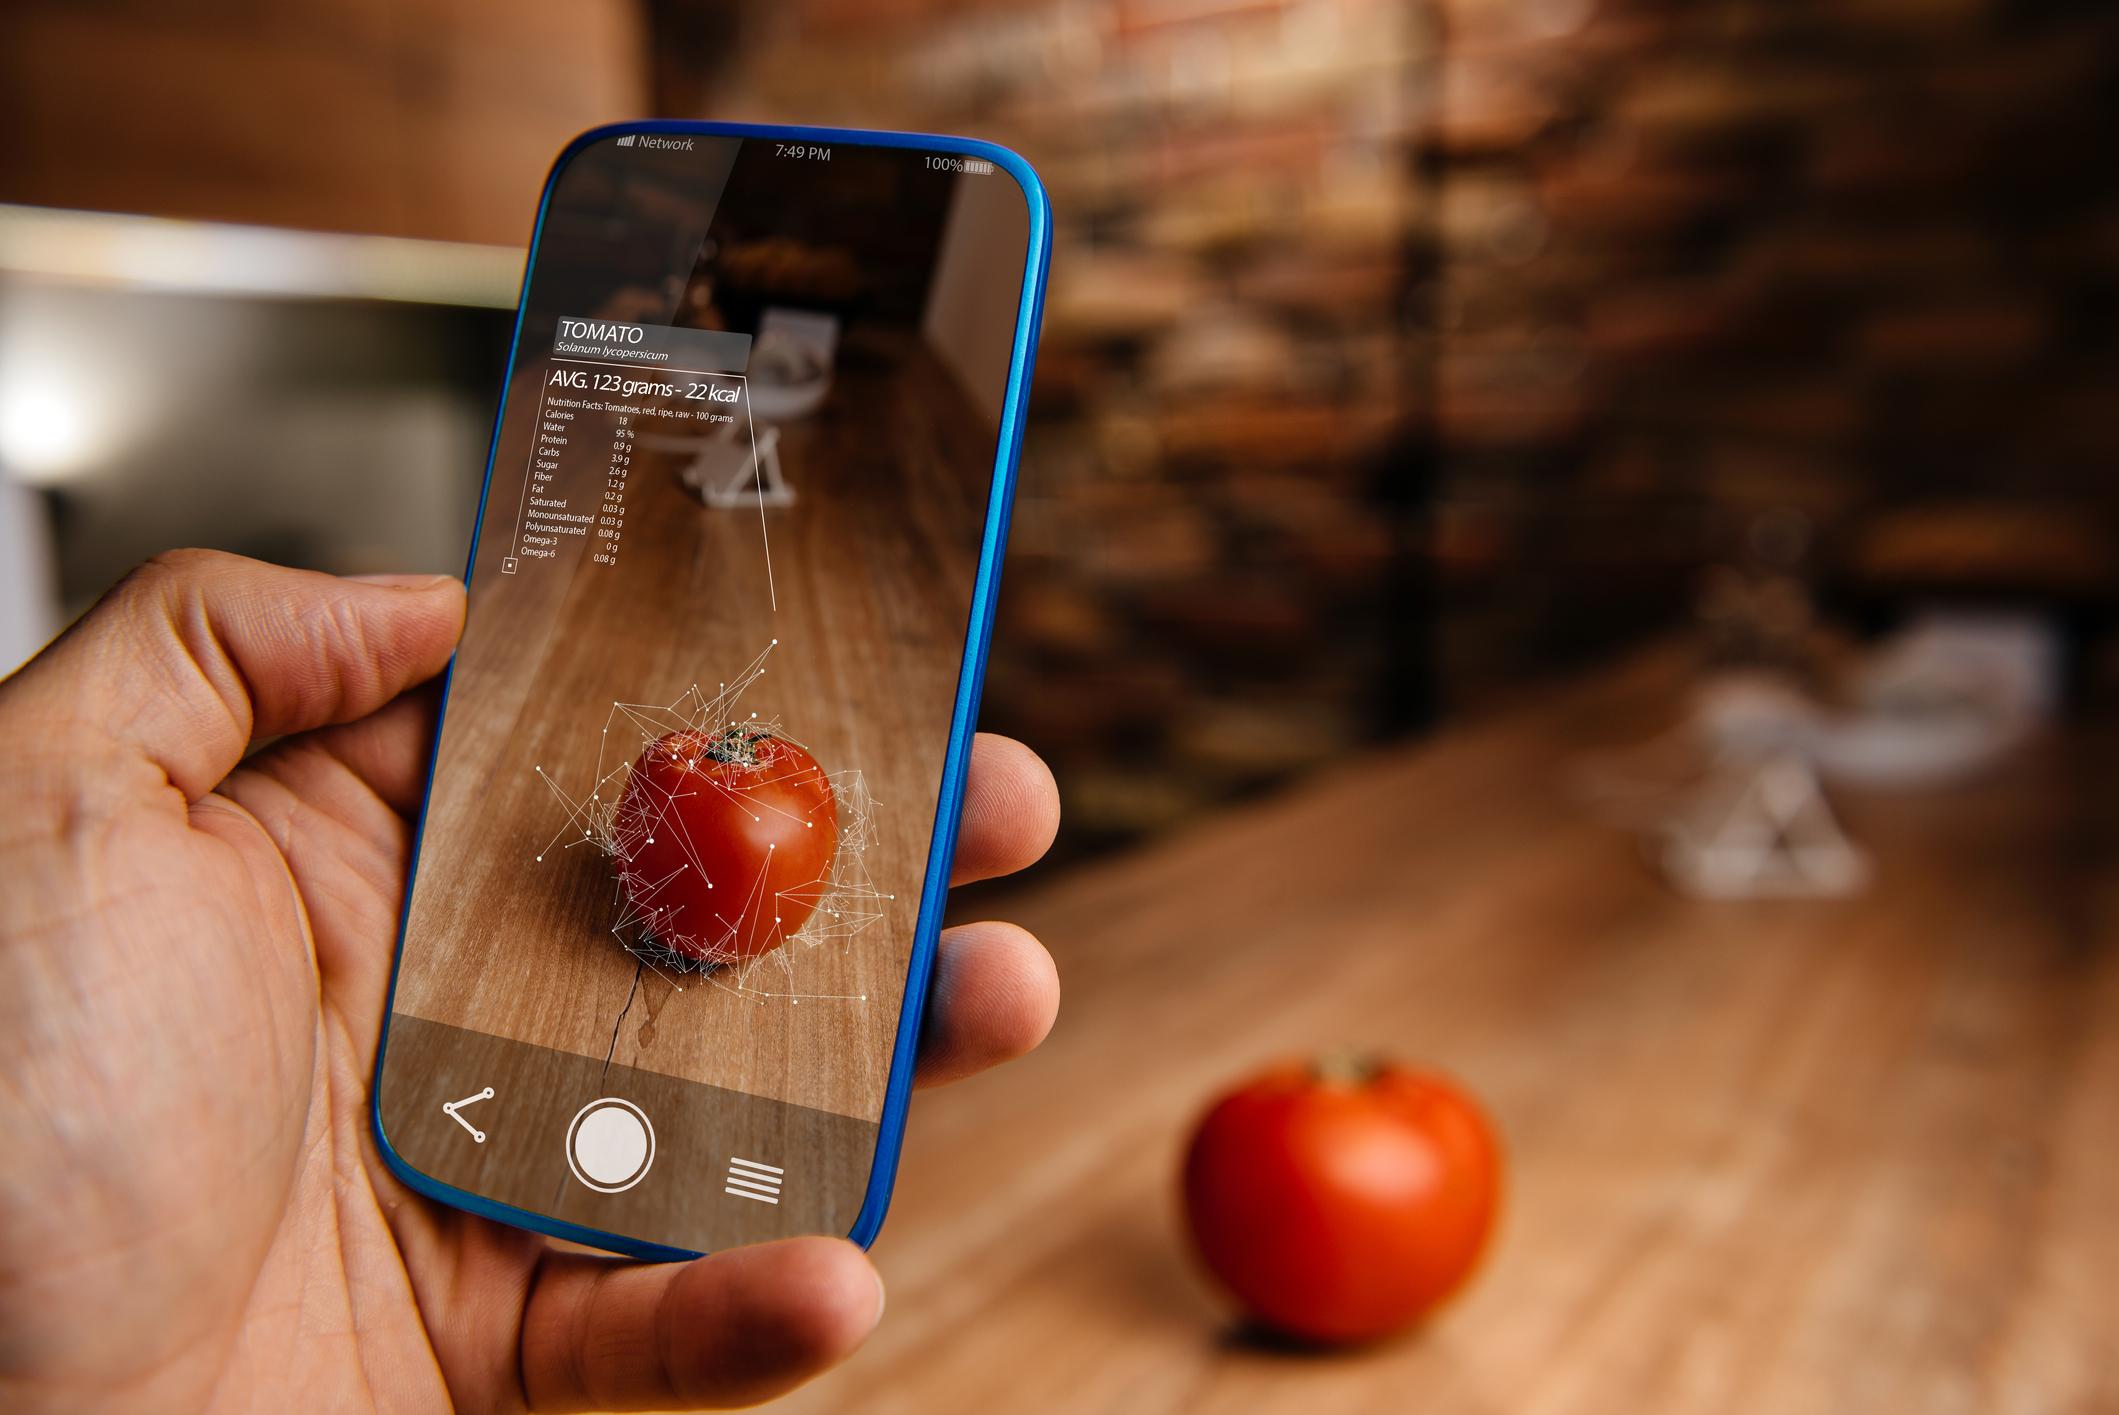 A man uses an AR smartphone app to scan an Apple.